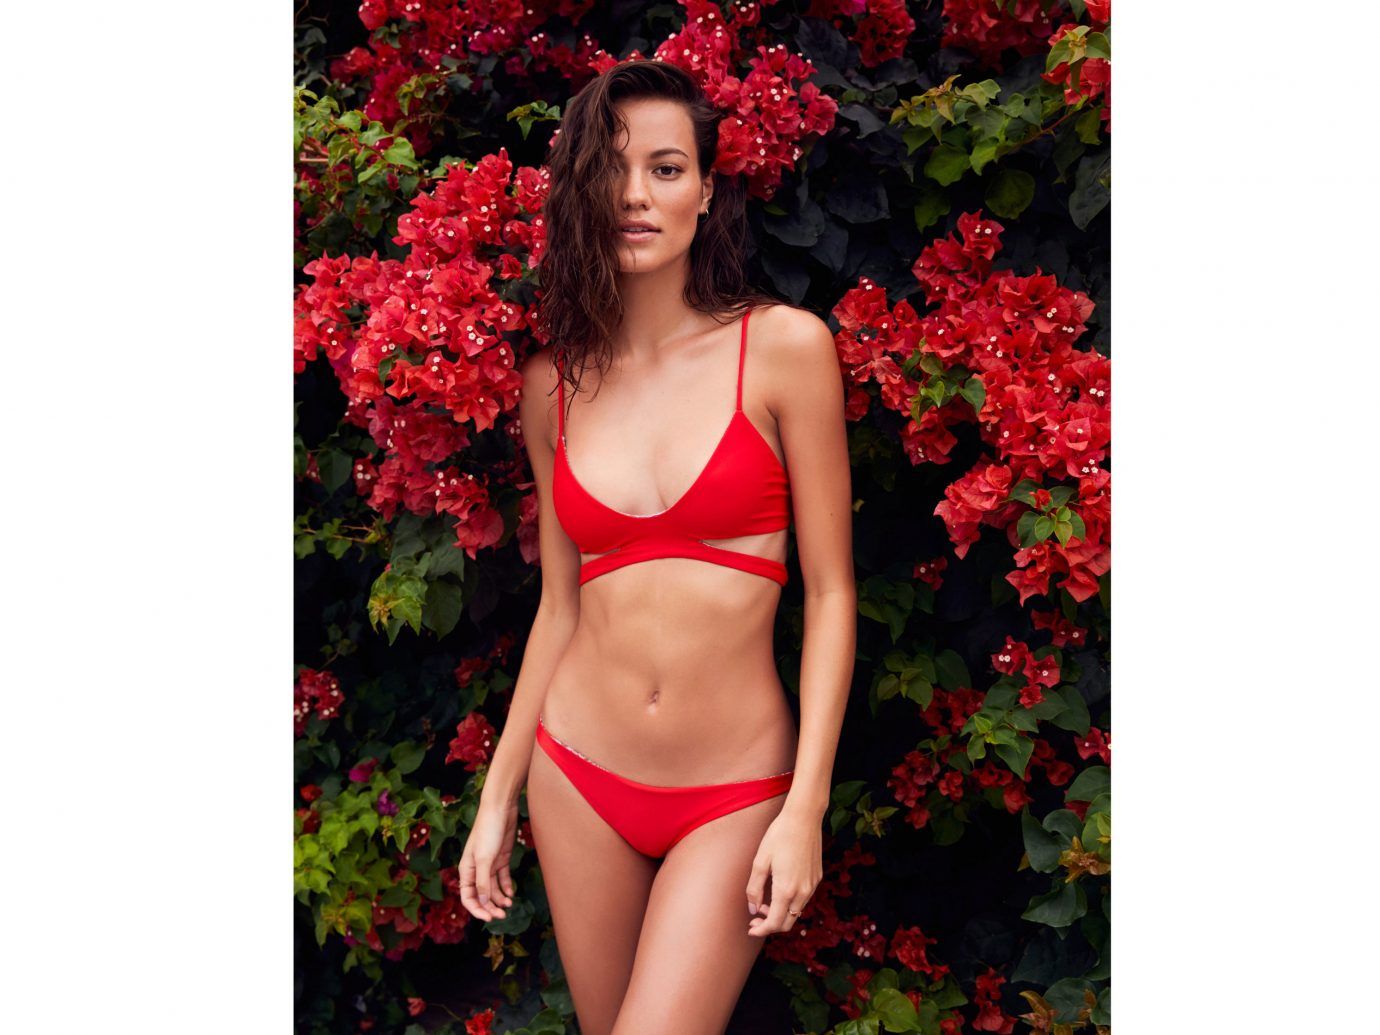 Style + Design clothing person woman swimsuit red posing dress standing undergarment lingerie swimwear beautiful petal long hair flower photo shoot dressed